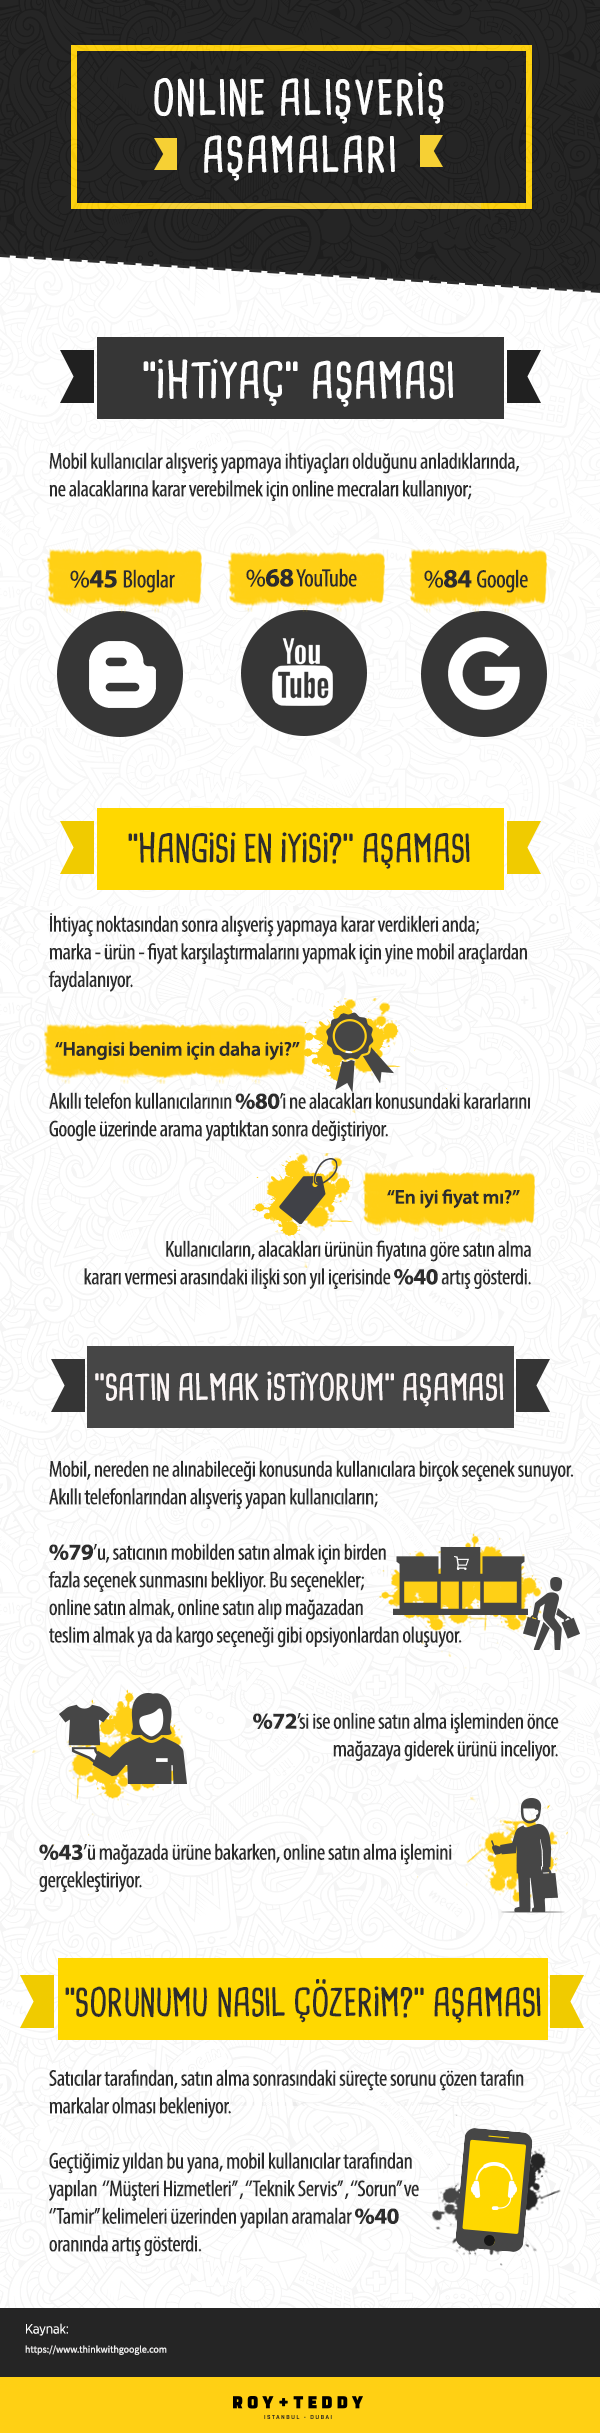 infografik07 (2)